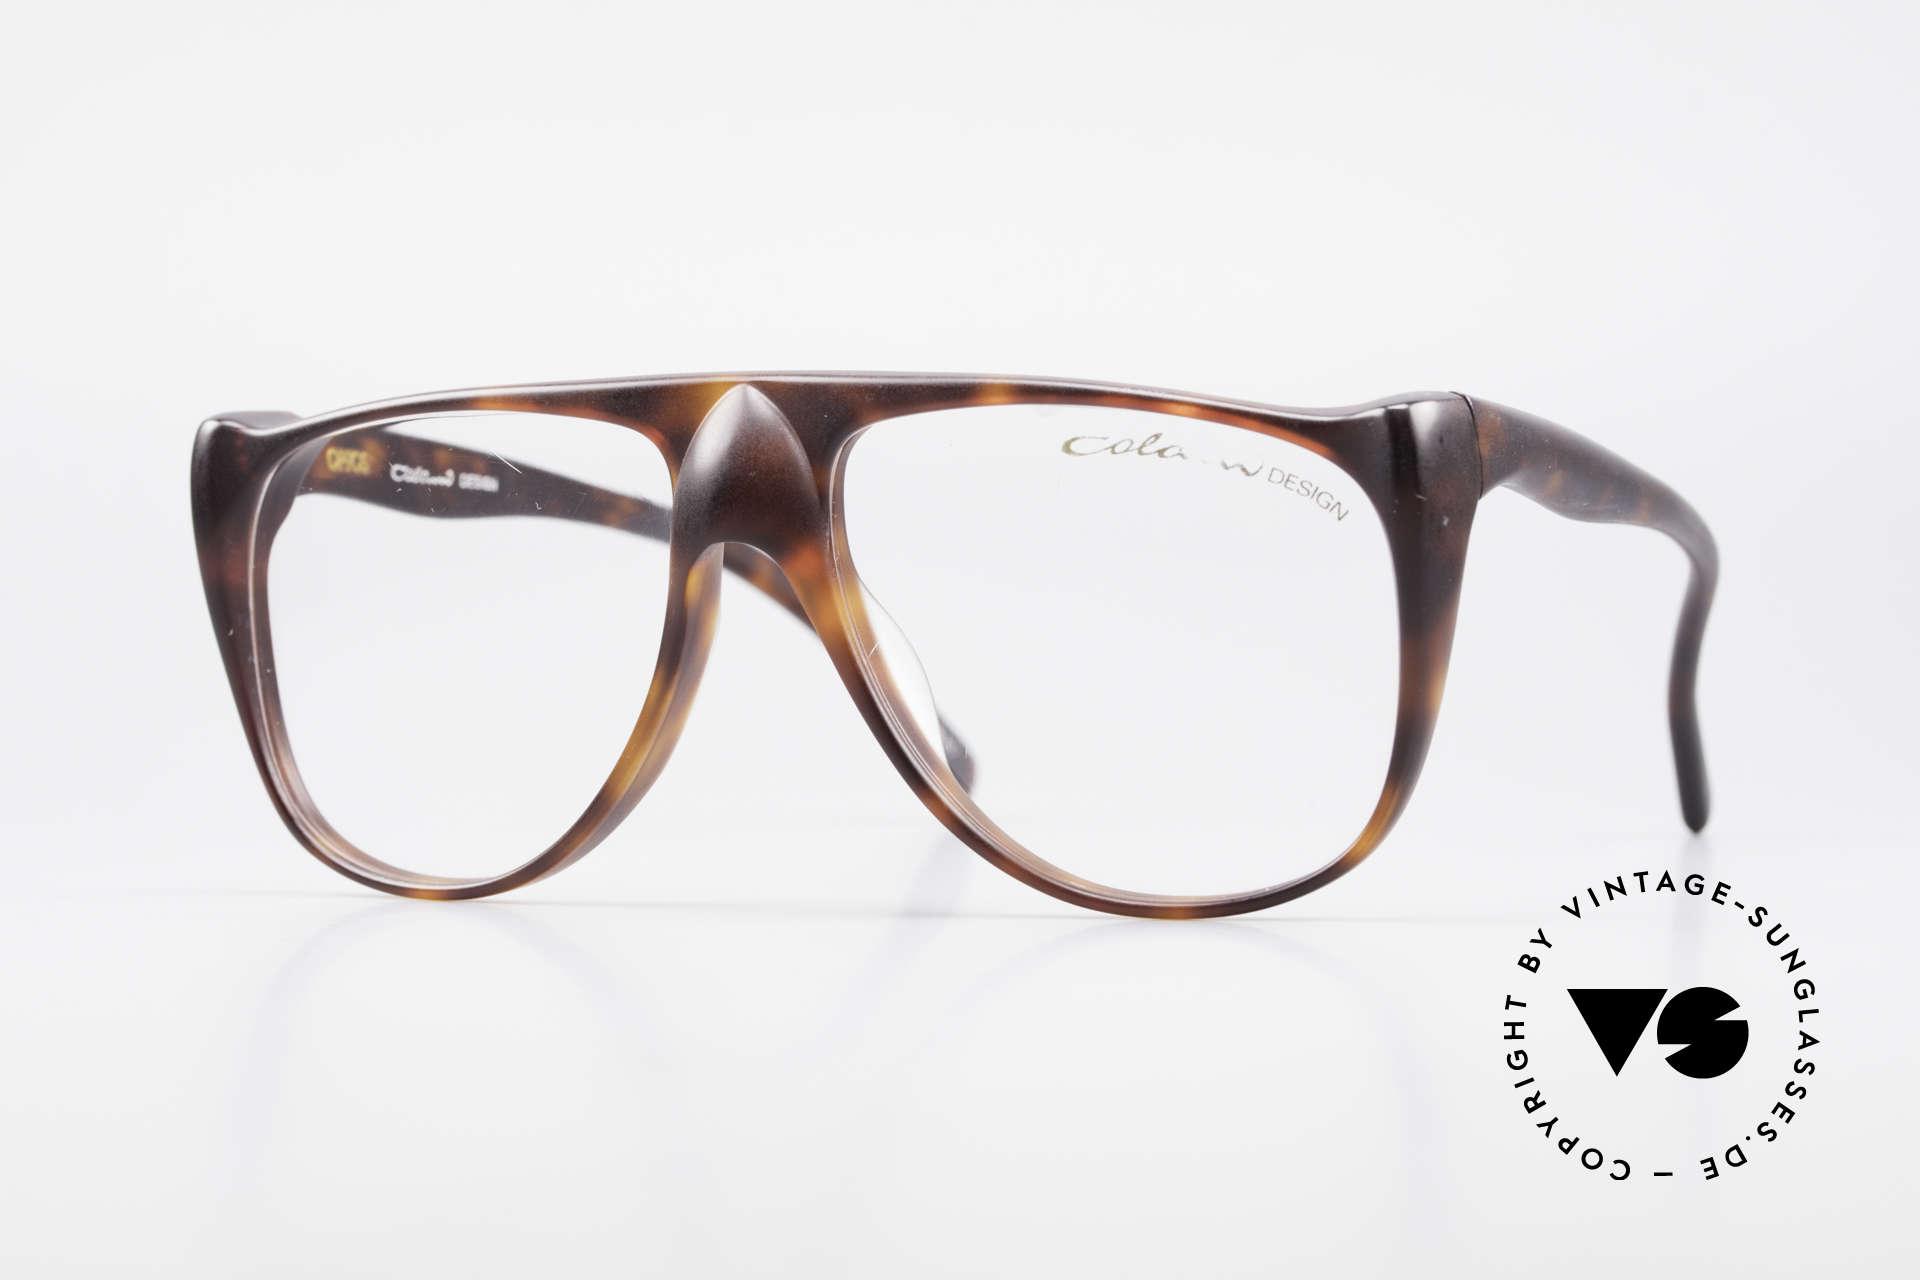 Colani 15-331 Extraordinary Vintage Frame, futuristic Luigi Colani designer eyeglasses of the 80's, Made for Men